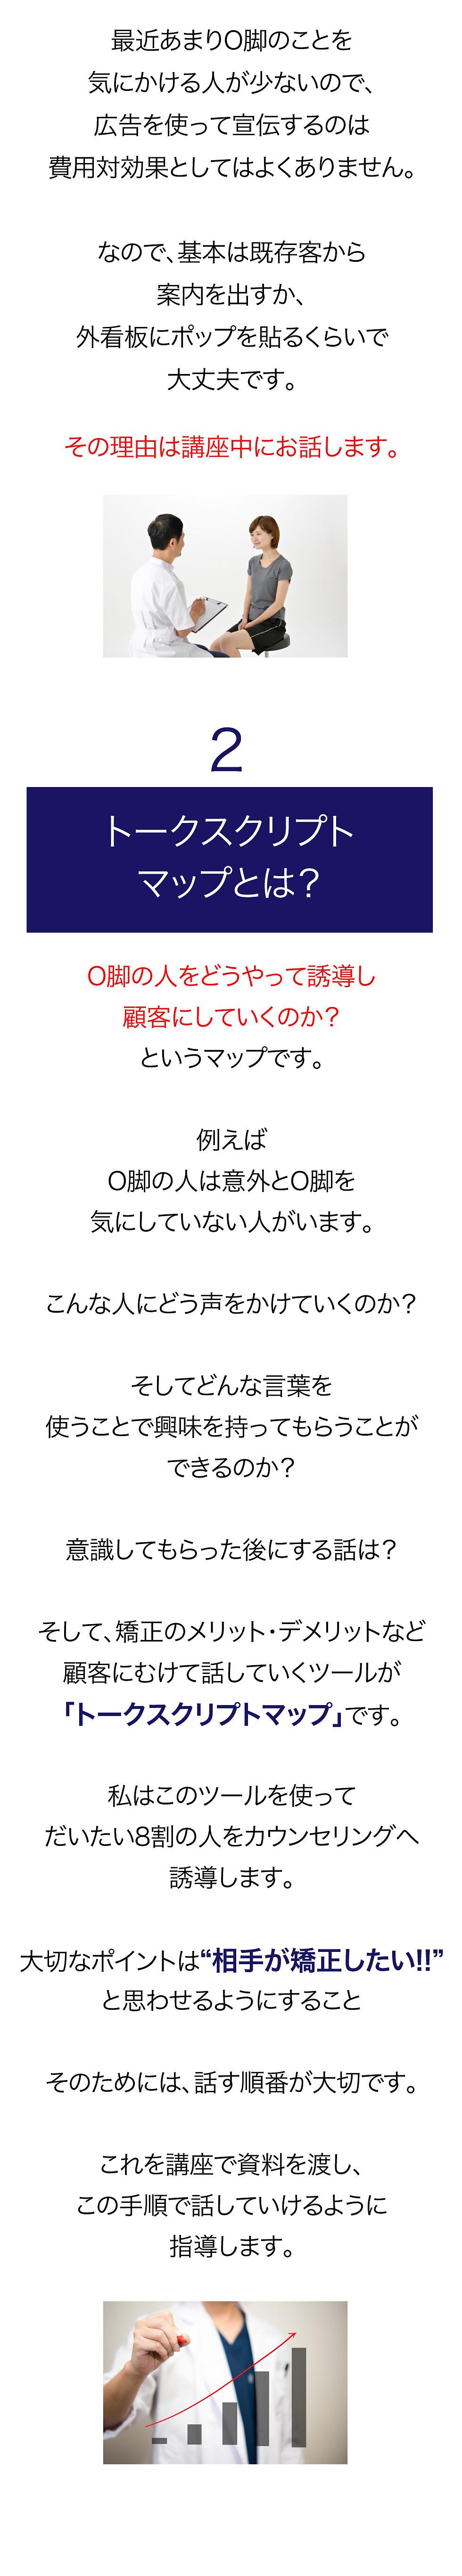 LP_野島式O脚矯正マスター講座_動画購入ページ_200107-06.jpg